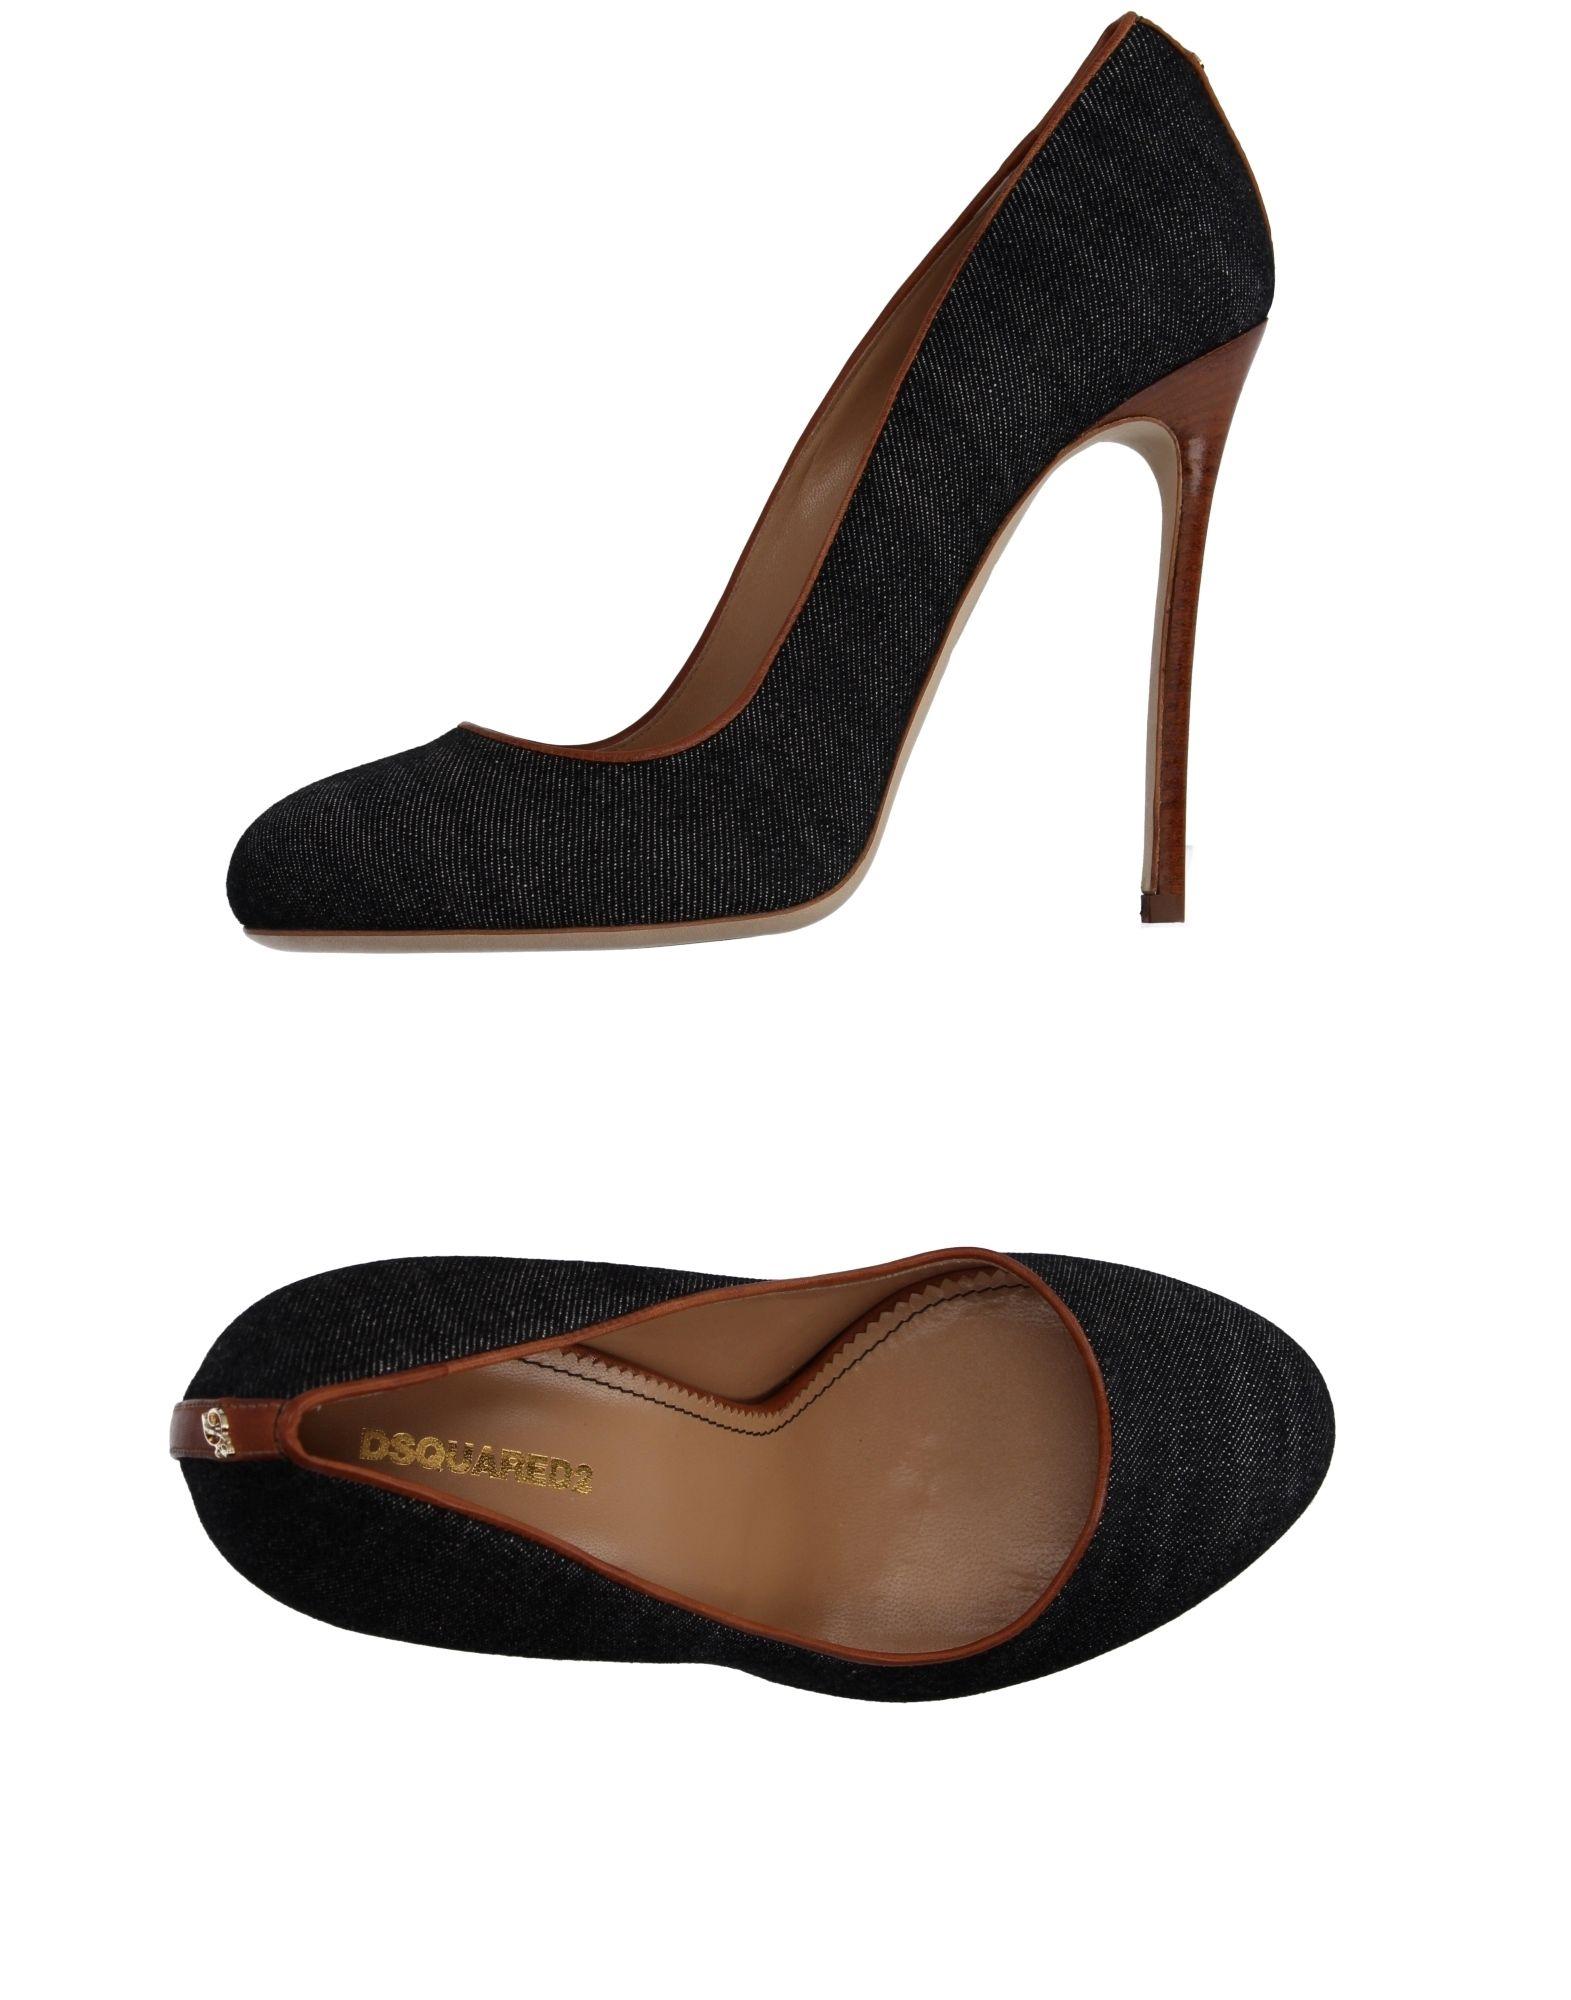 Dsquared2 Pumps Damen  11066021OUGut aussehende strapazierfähige Schuhe